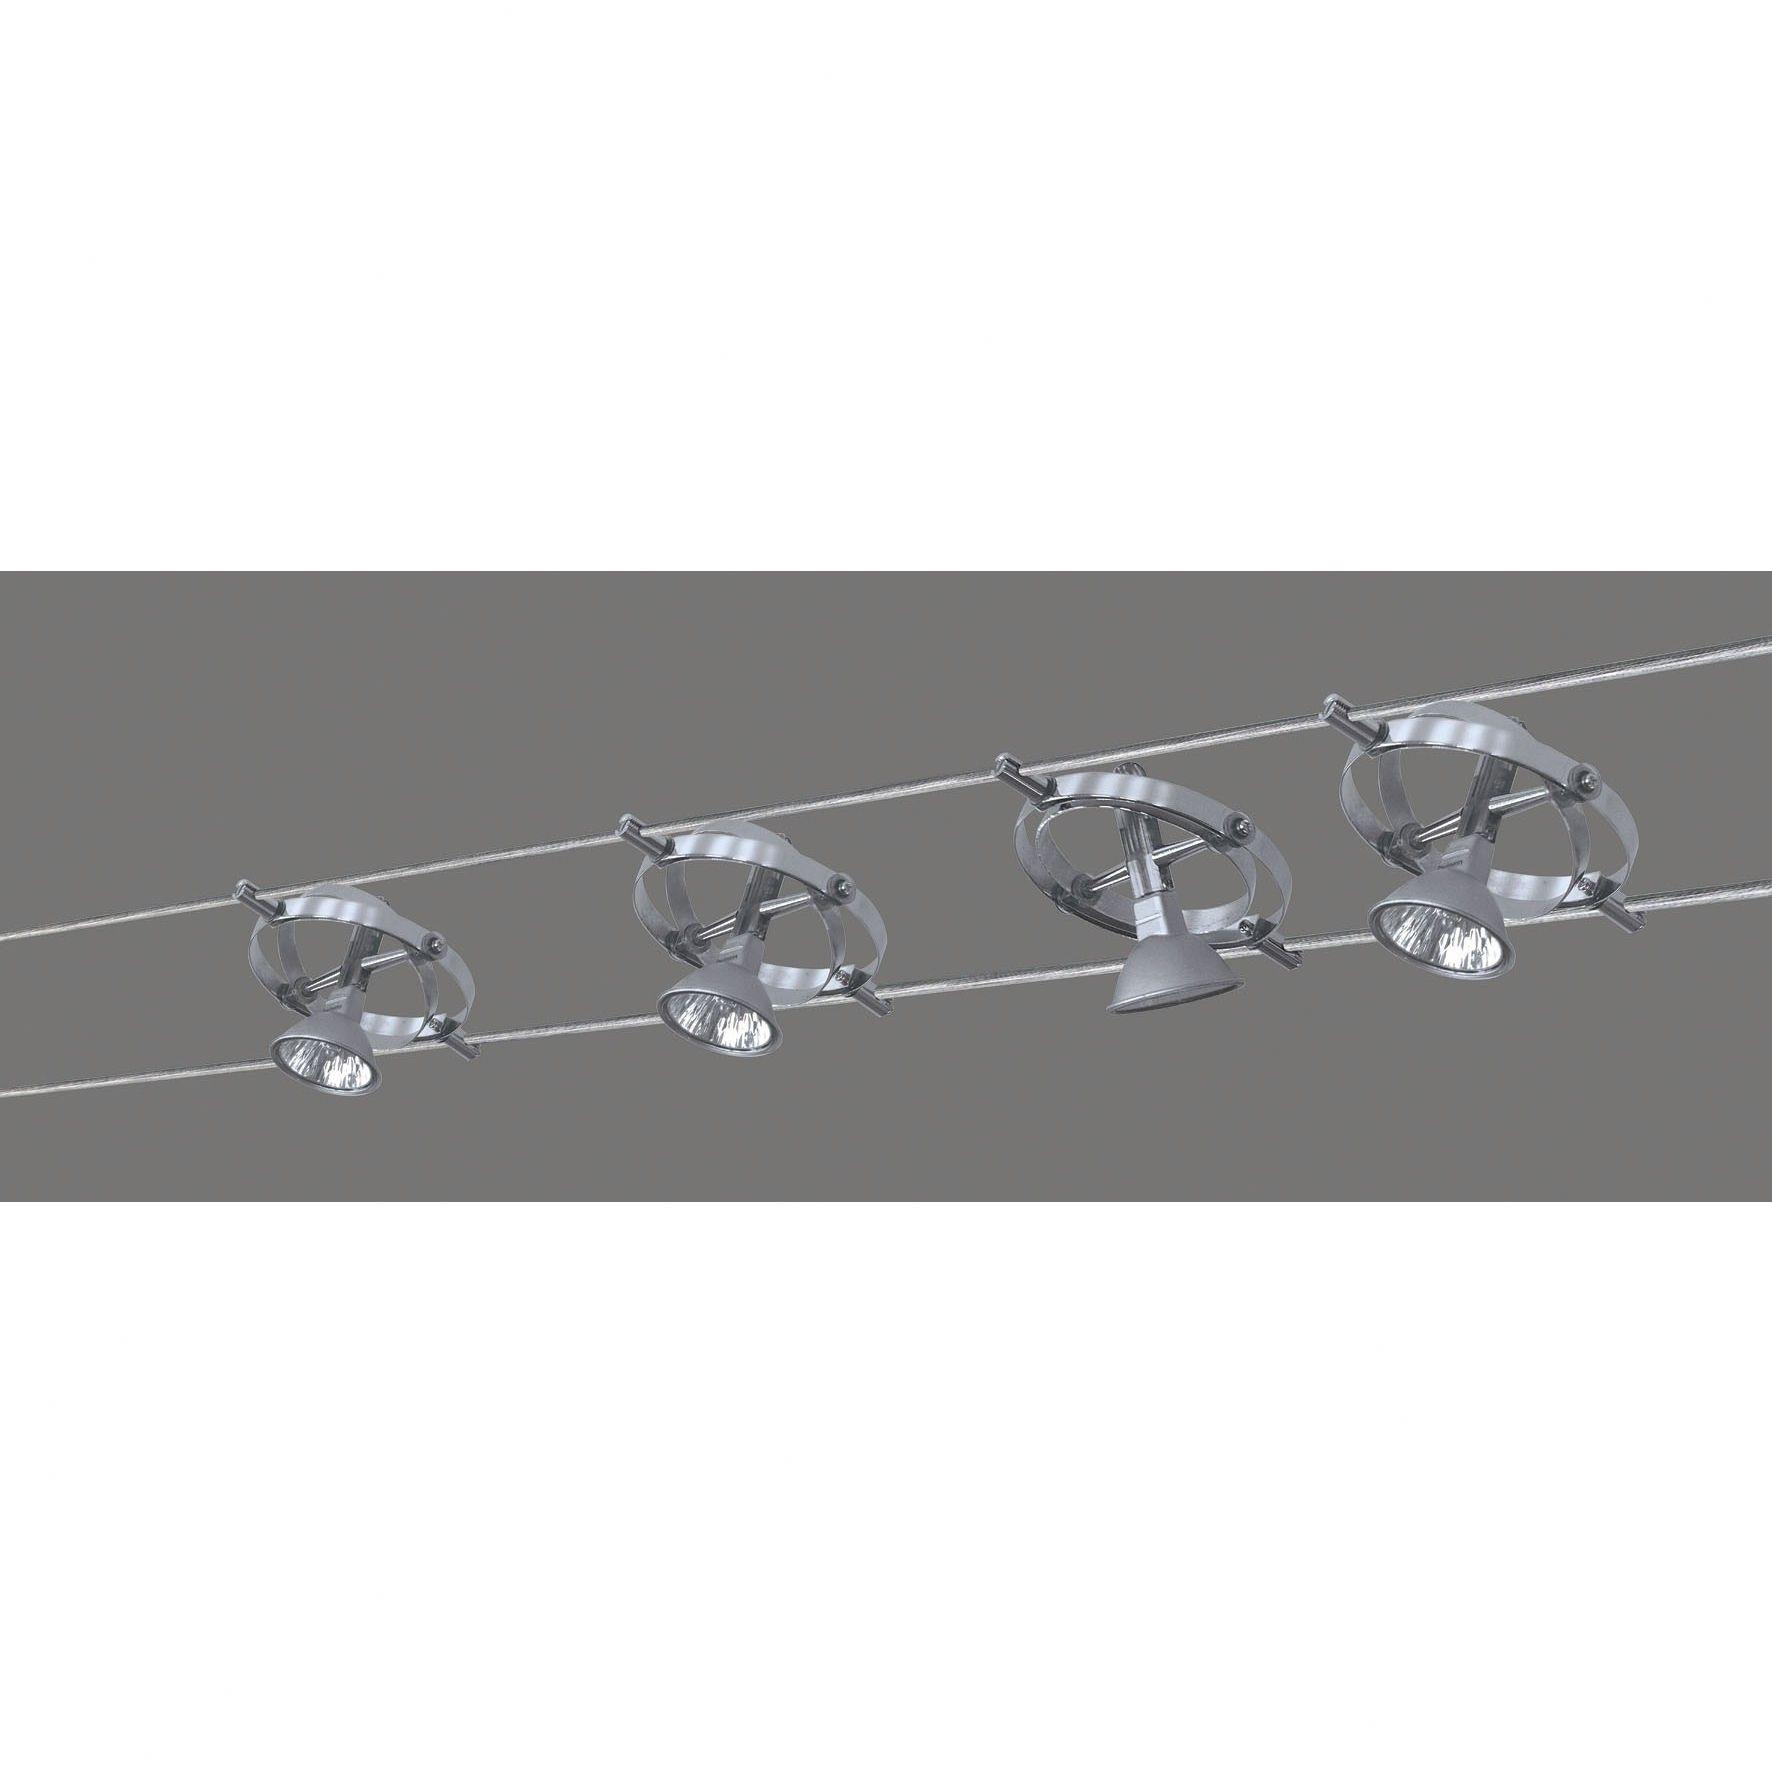 12v Led Track Lighting Systems: Paulmann Wire For 12V Track Lighting System Would This